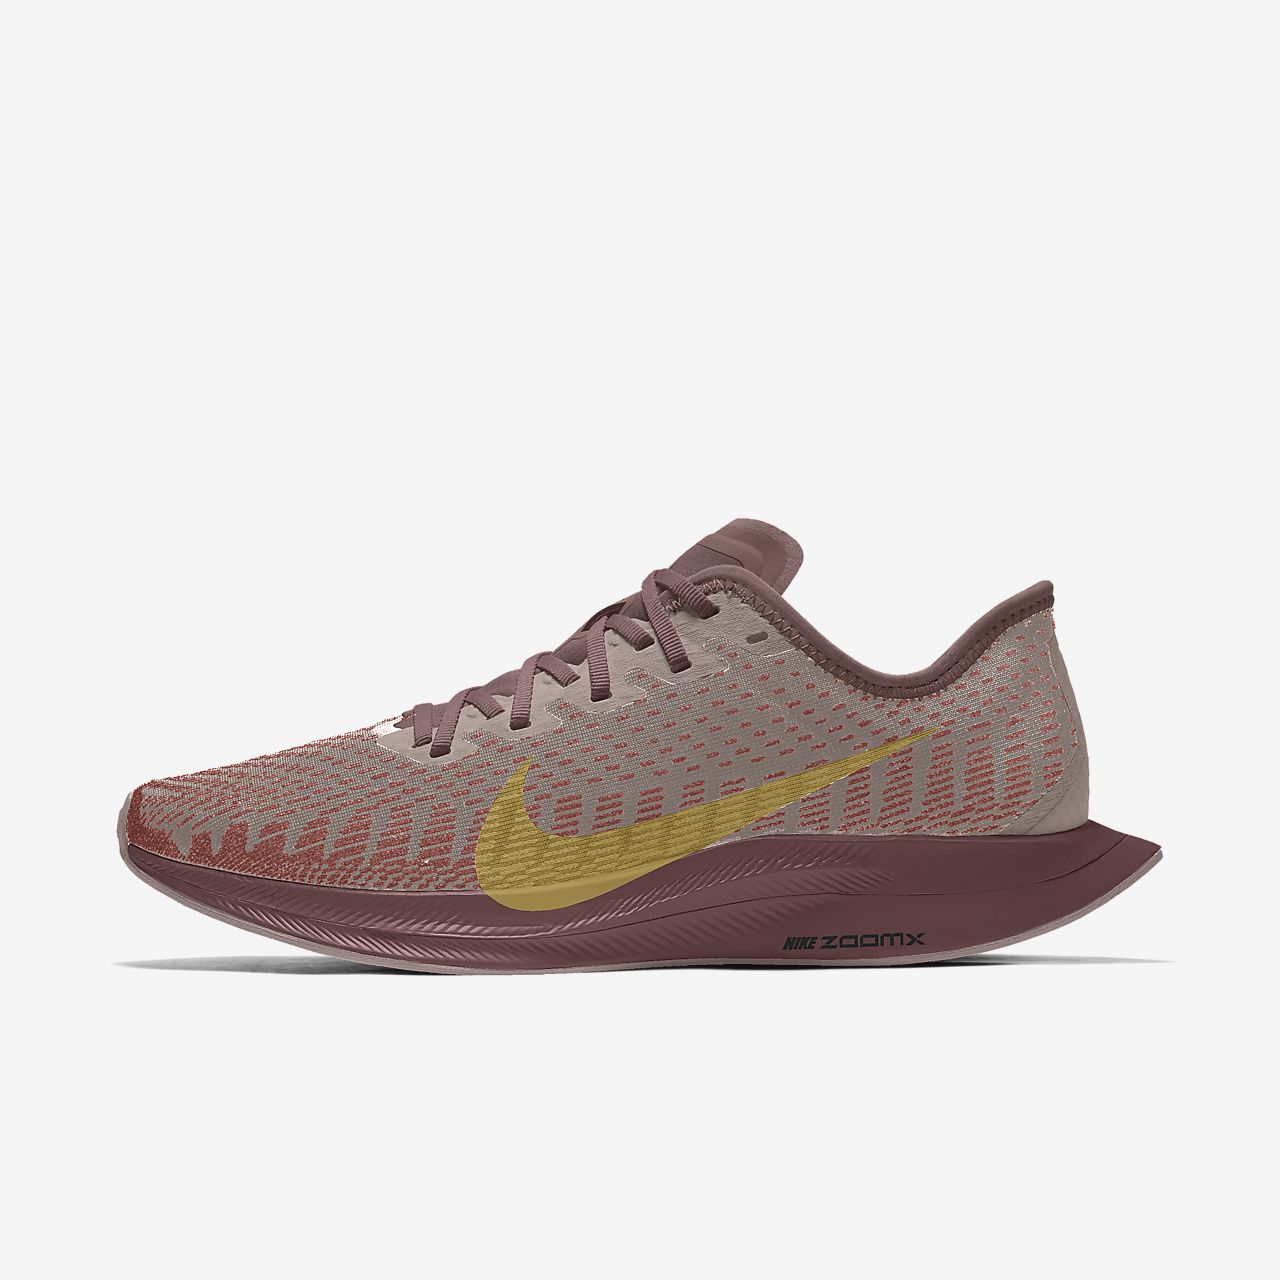 Calzado de running para mujer personalizado Nike Zoom Pegasus Turbo 2 Premium By You